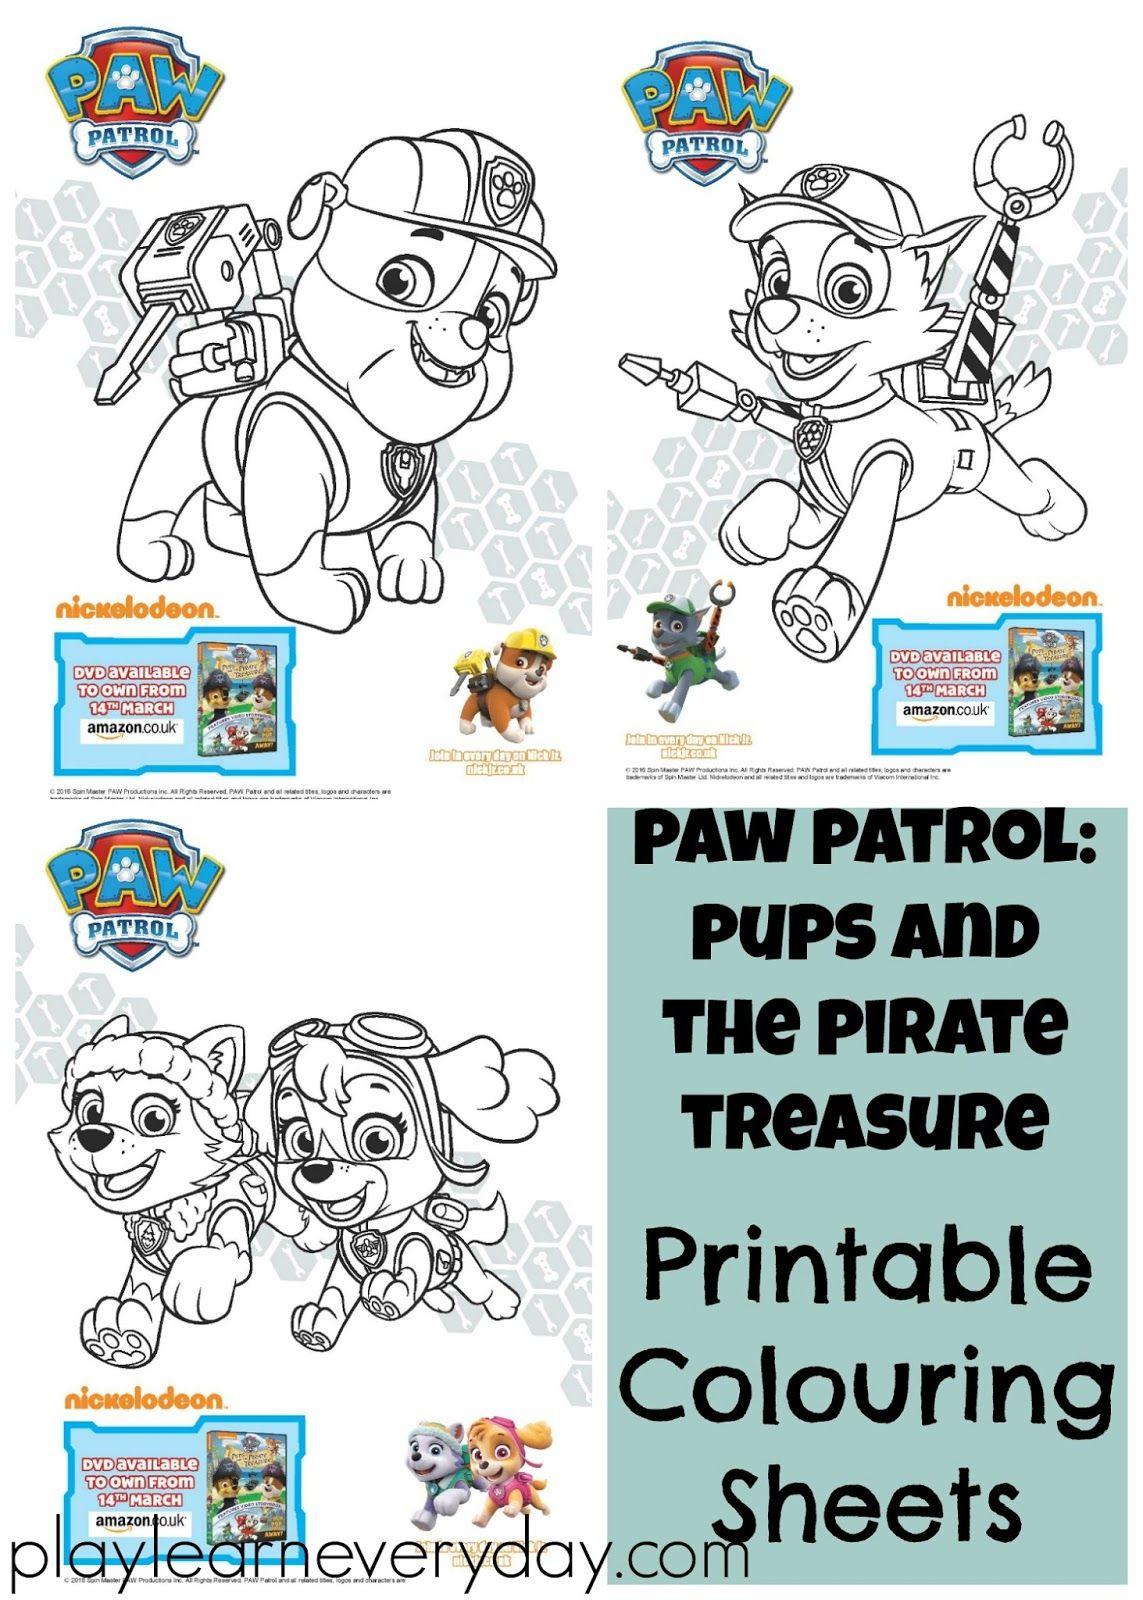 Paw Patrol Pups And The Pirate Treasure Paw Patrol Paw